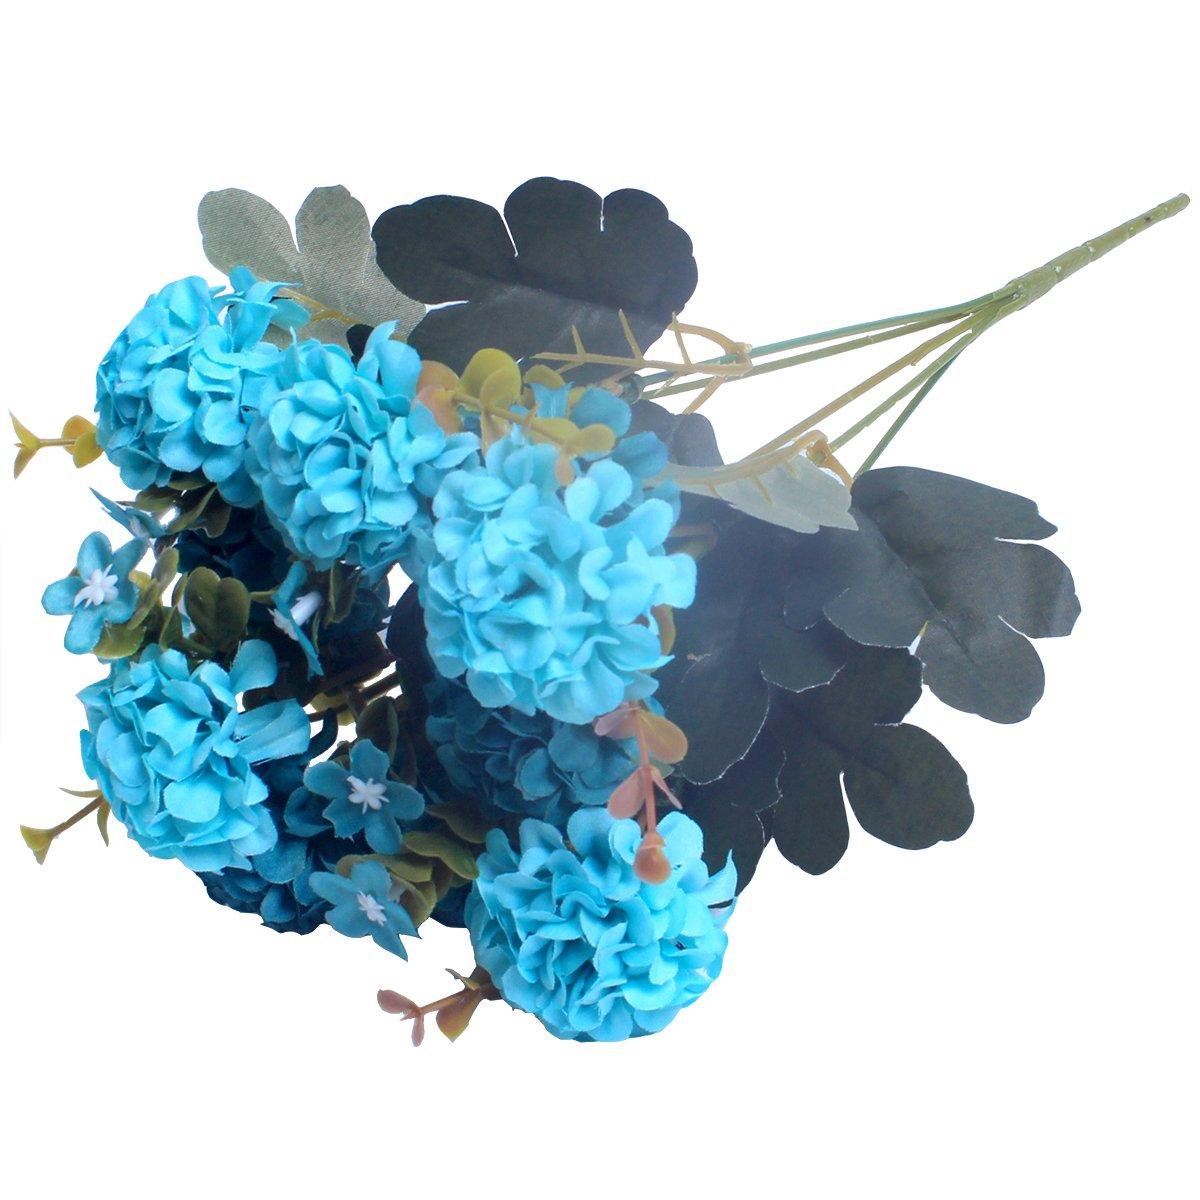 1-Bunch-European-Artificial-Flower-Fake-10-Heads-Hydrangea-Bouquet-Wedding-Arrangement-Christmas-Home-Decoration